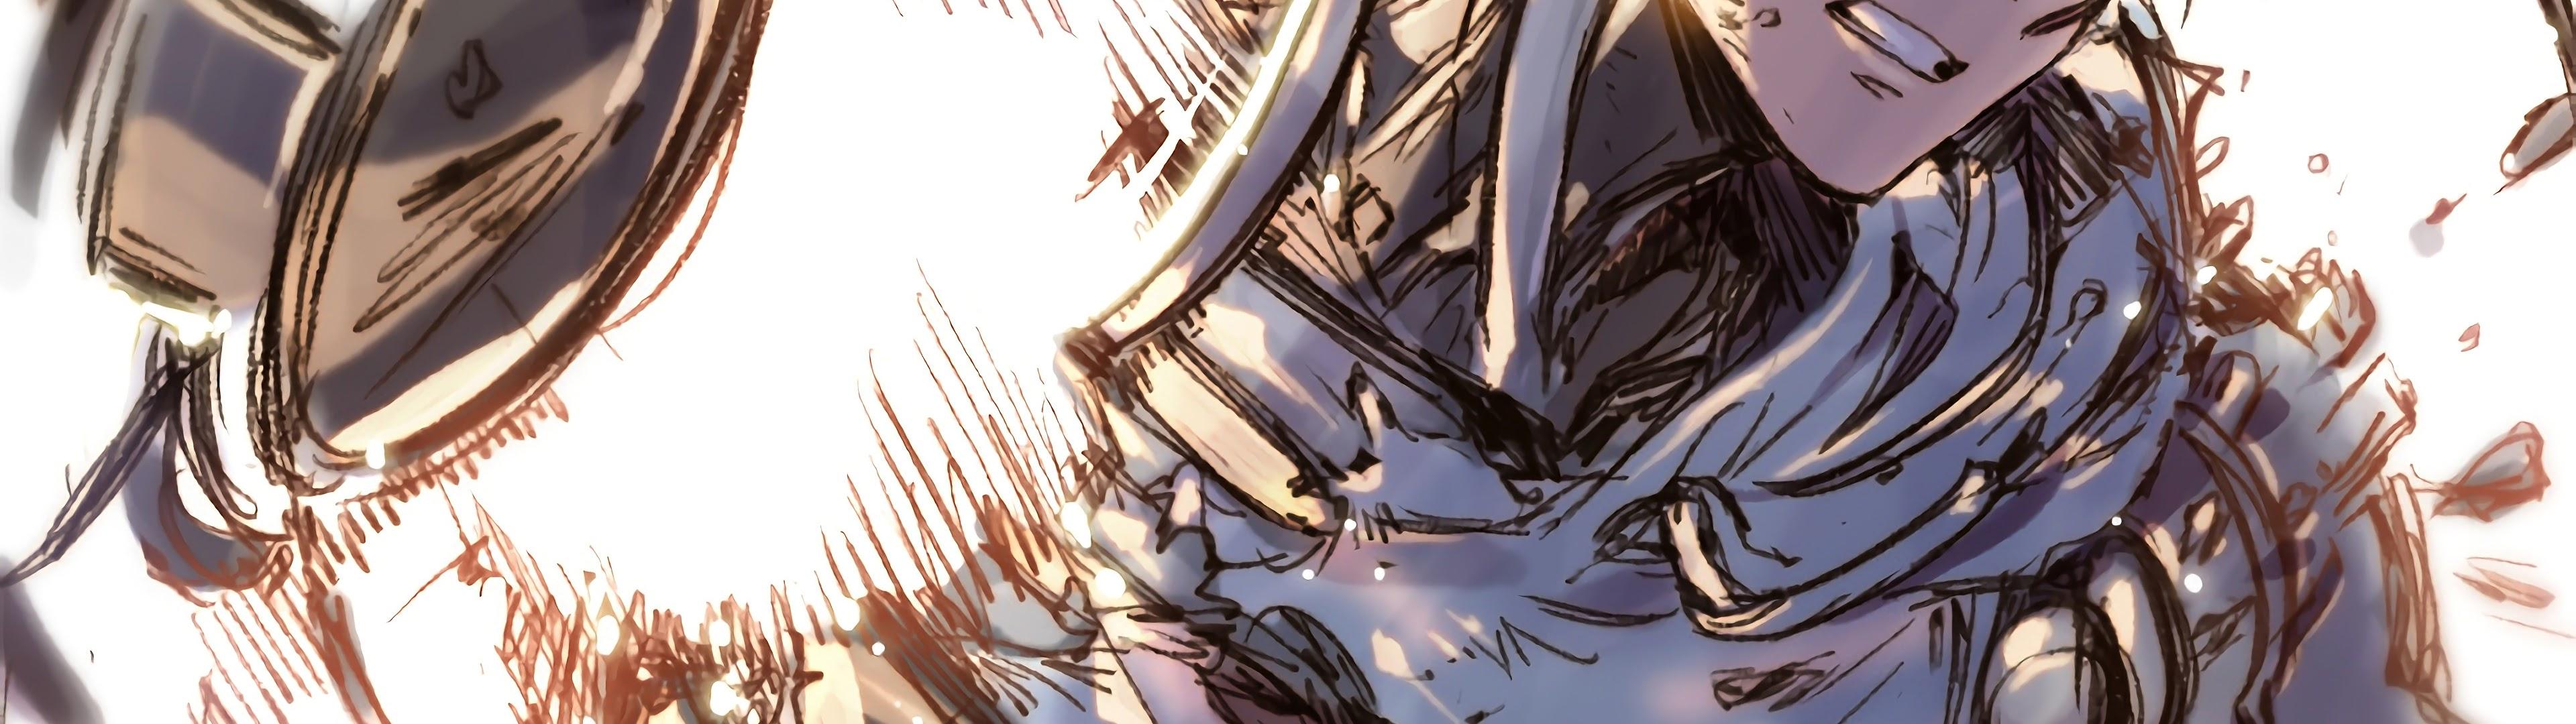 Genos One Punch Man 4k Wallpaper 12